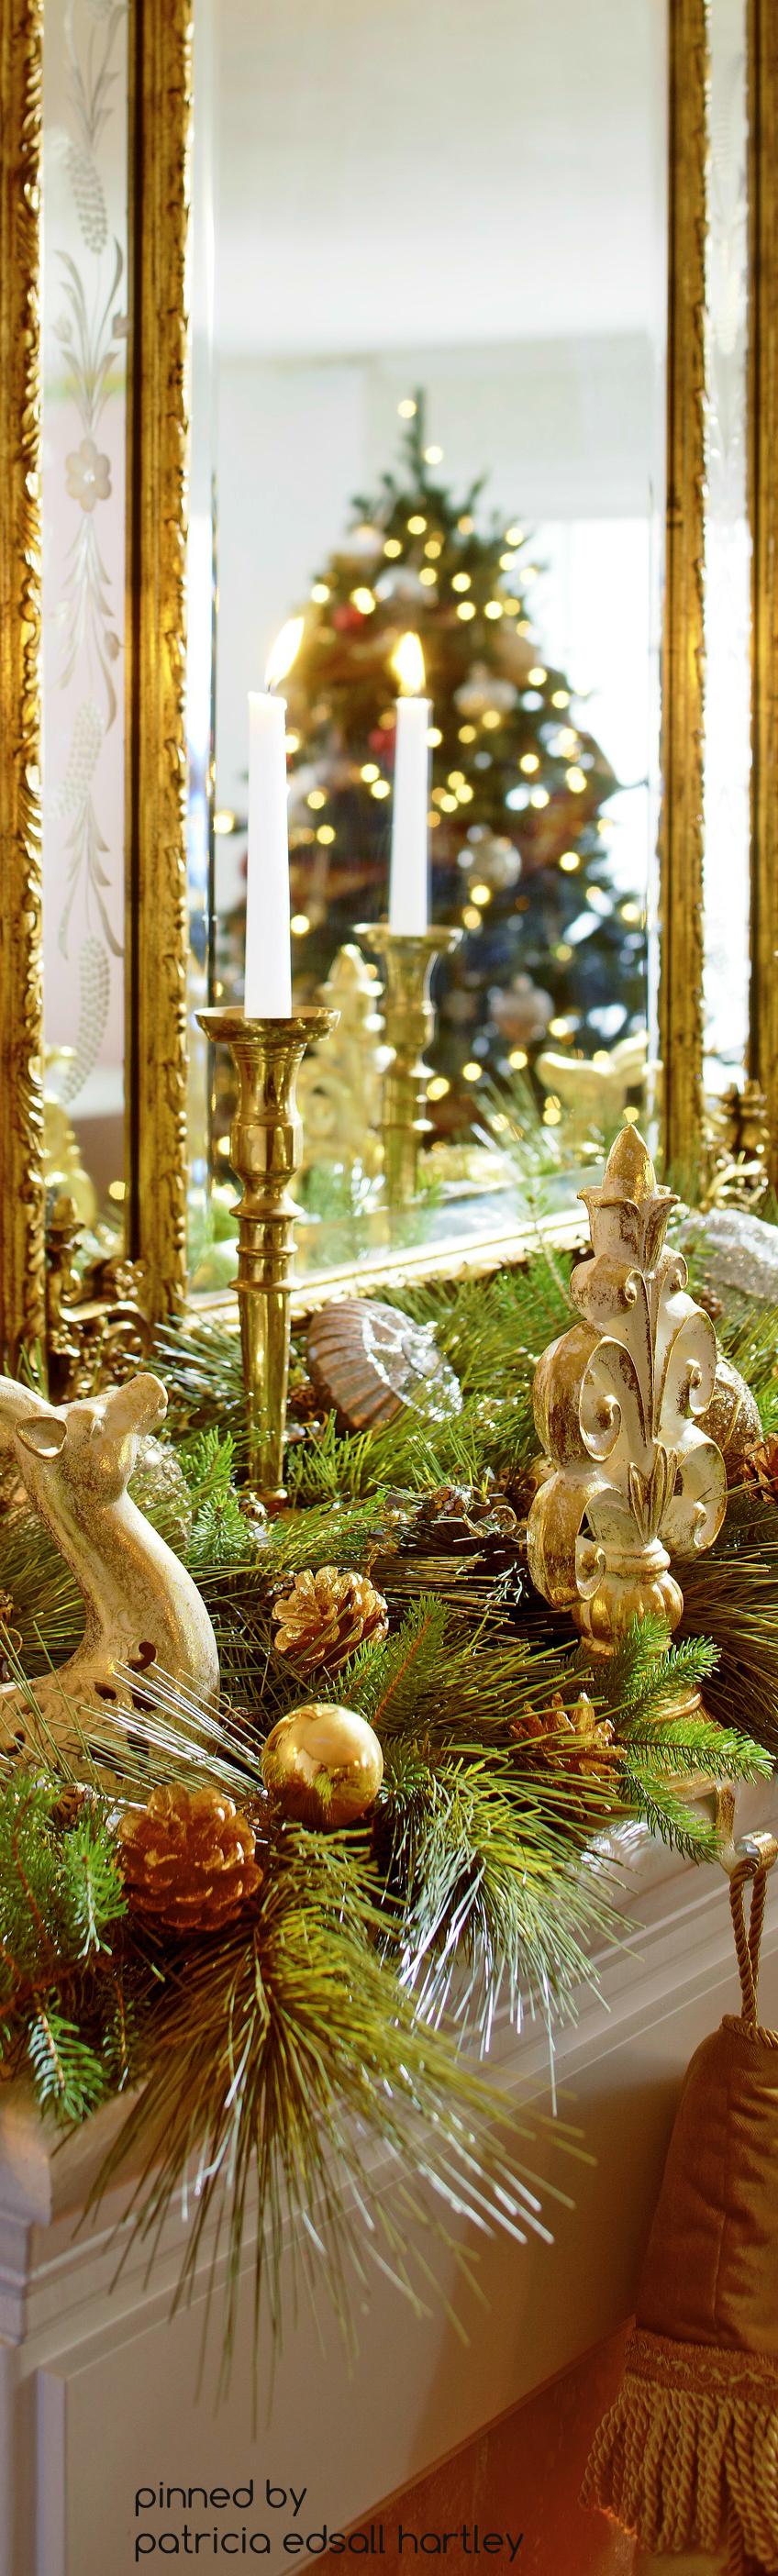 Christmas at miss millionairessus ruthinteriors pinterest